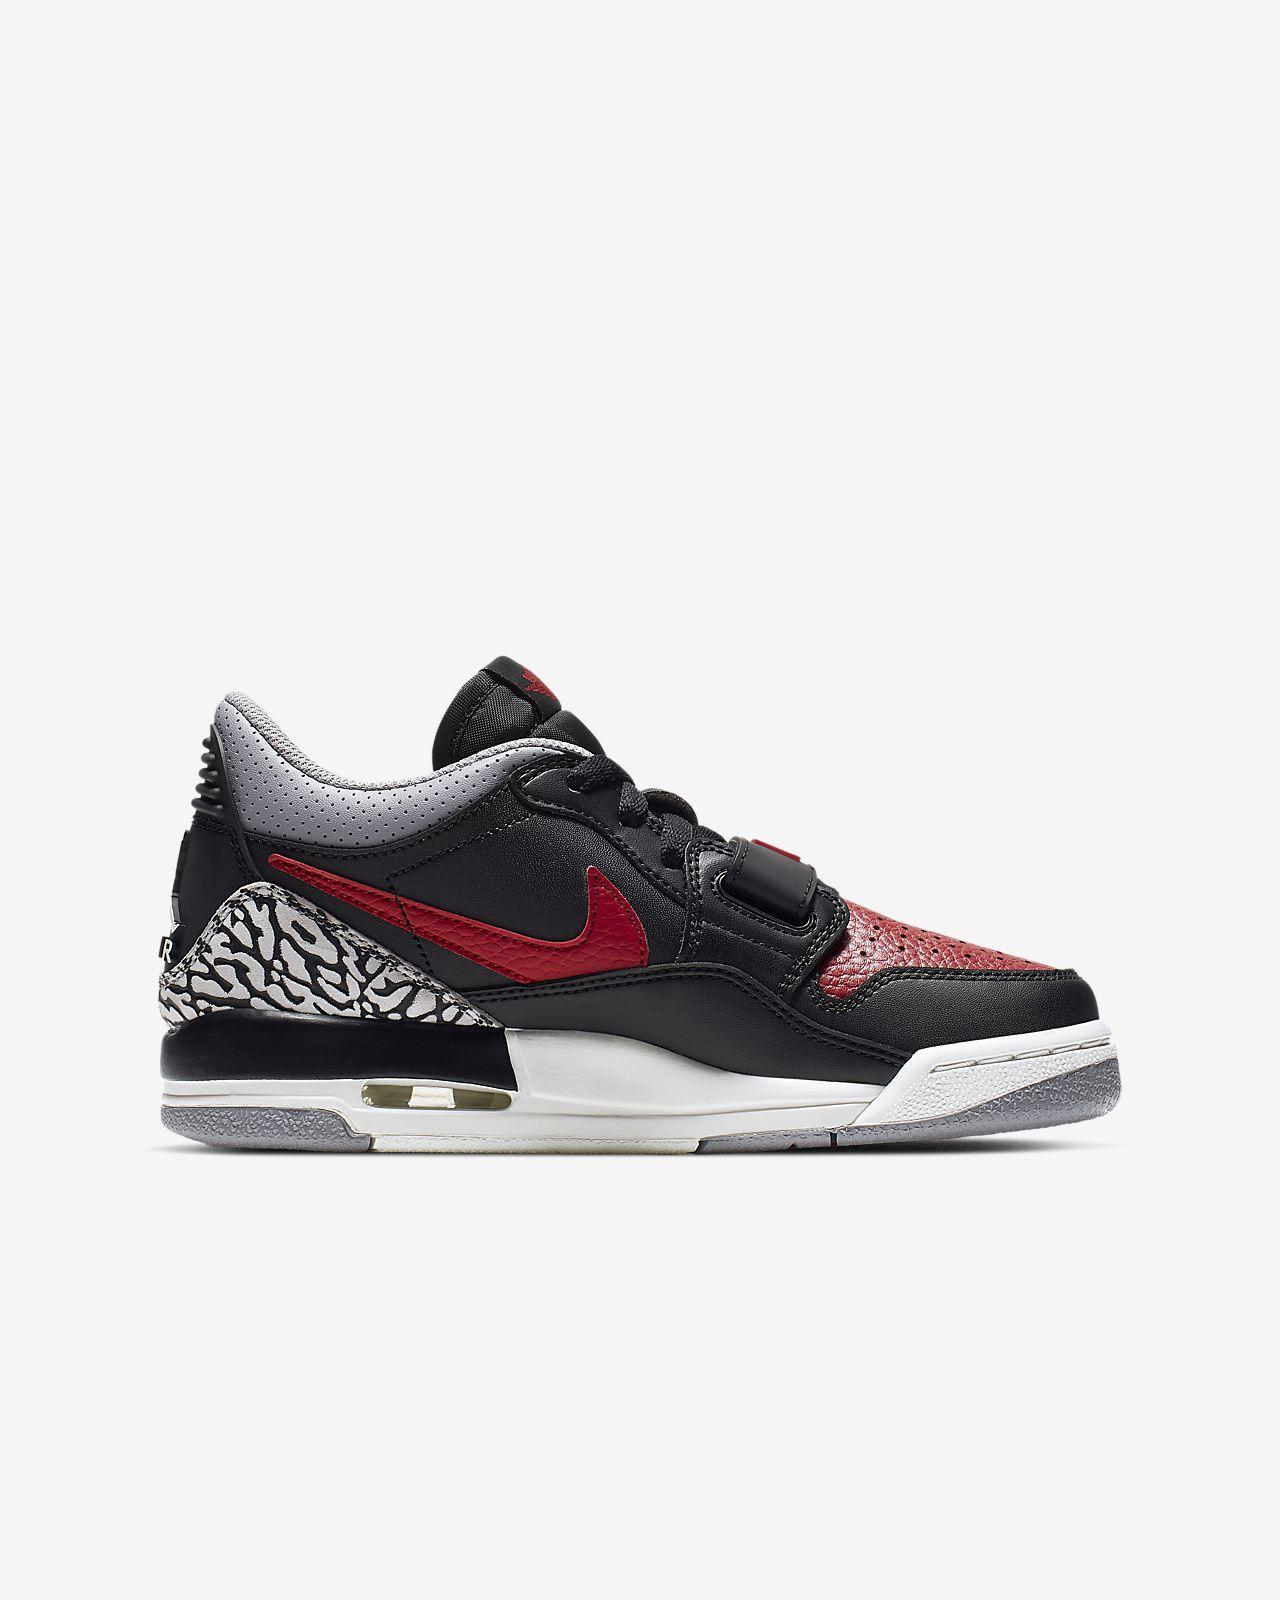 852f55465df0 Air Jordan Legacy 312 Low Older Kids  Shoe. Nike.com AU